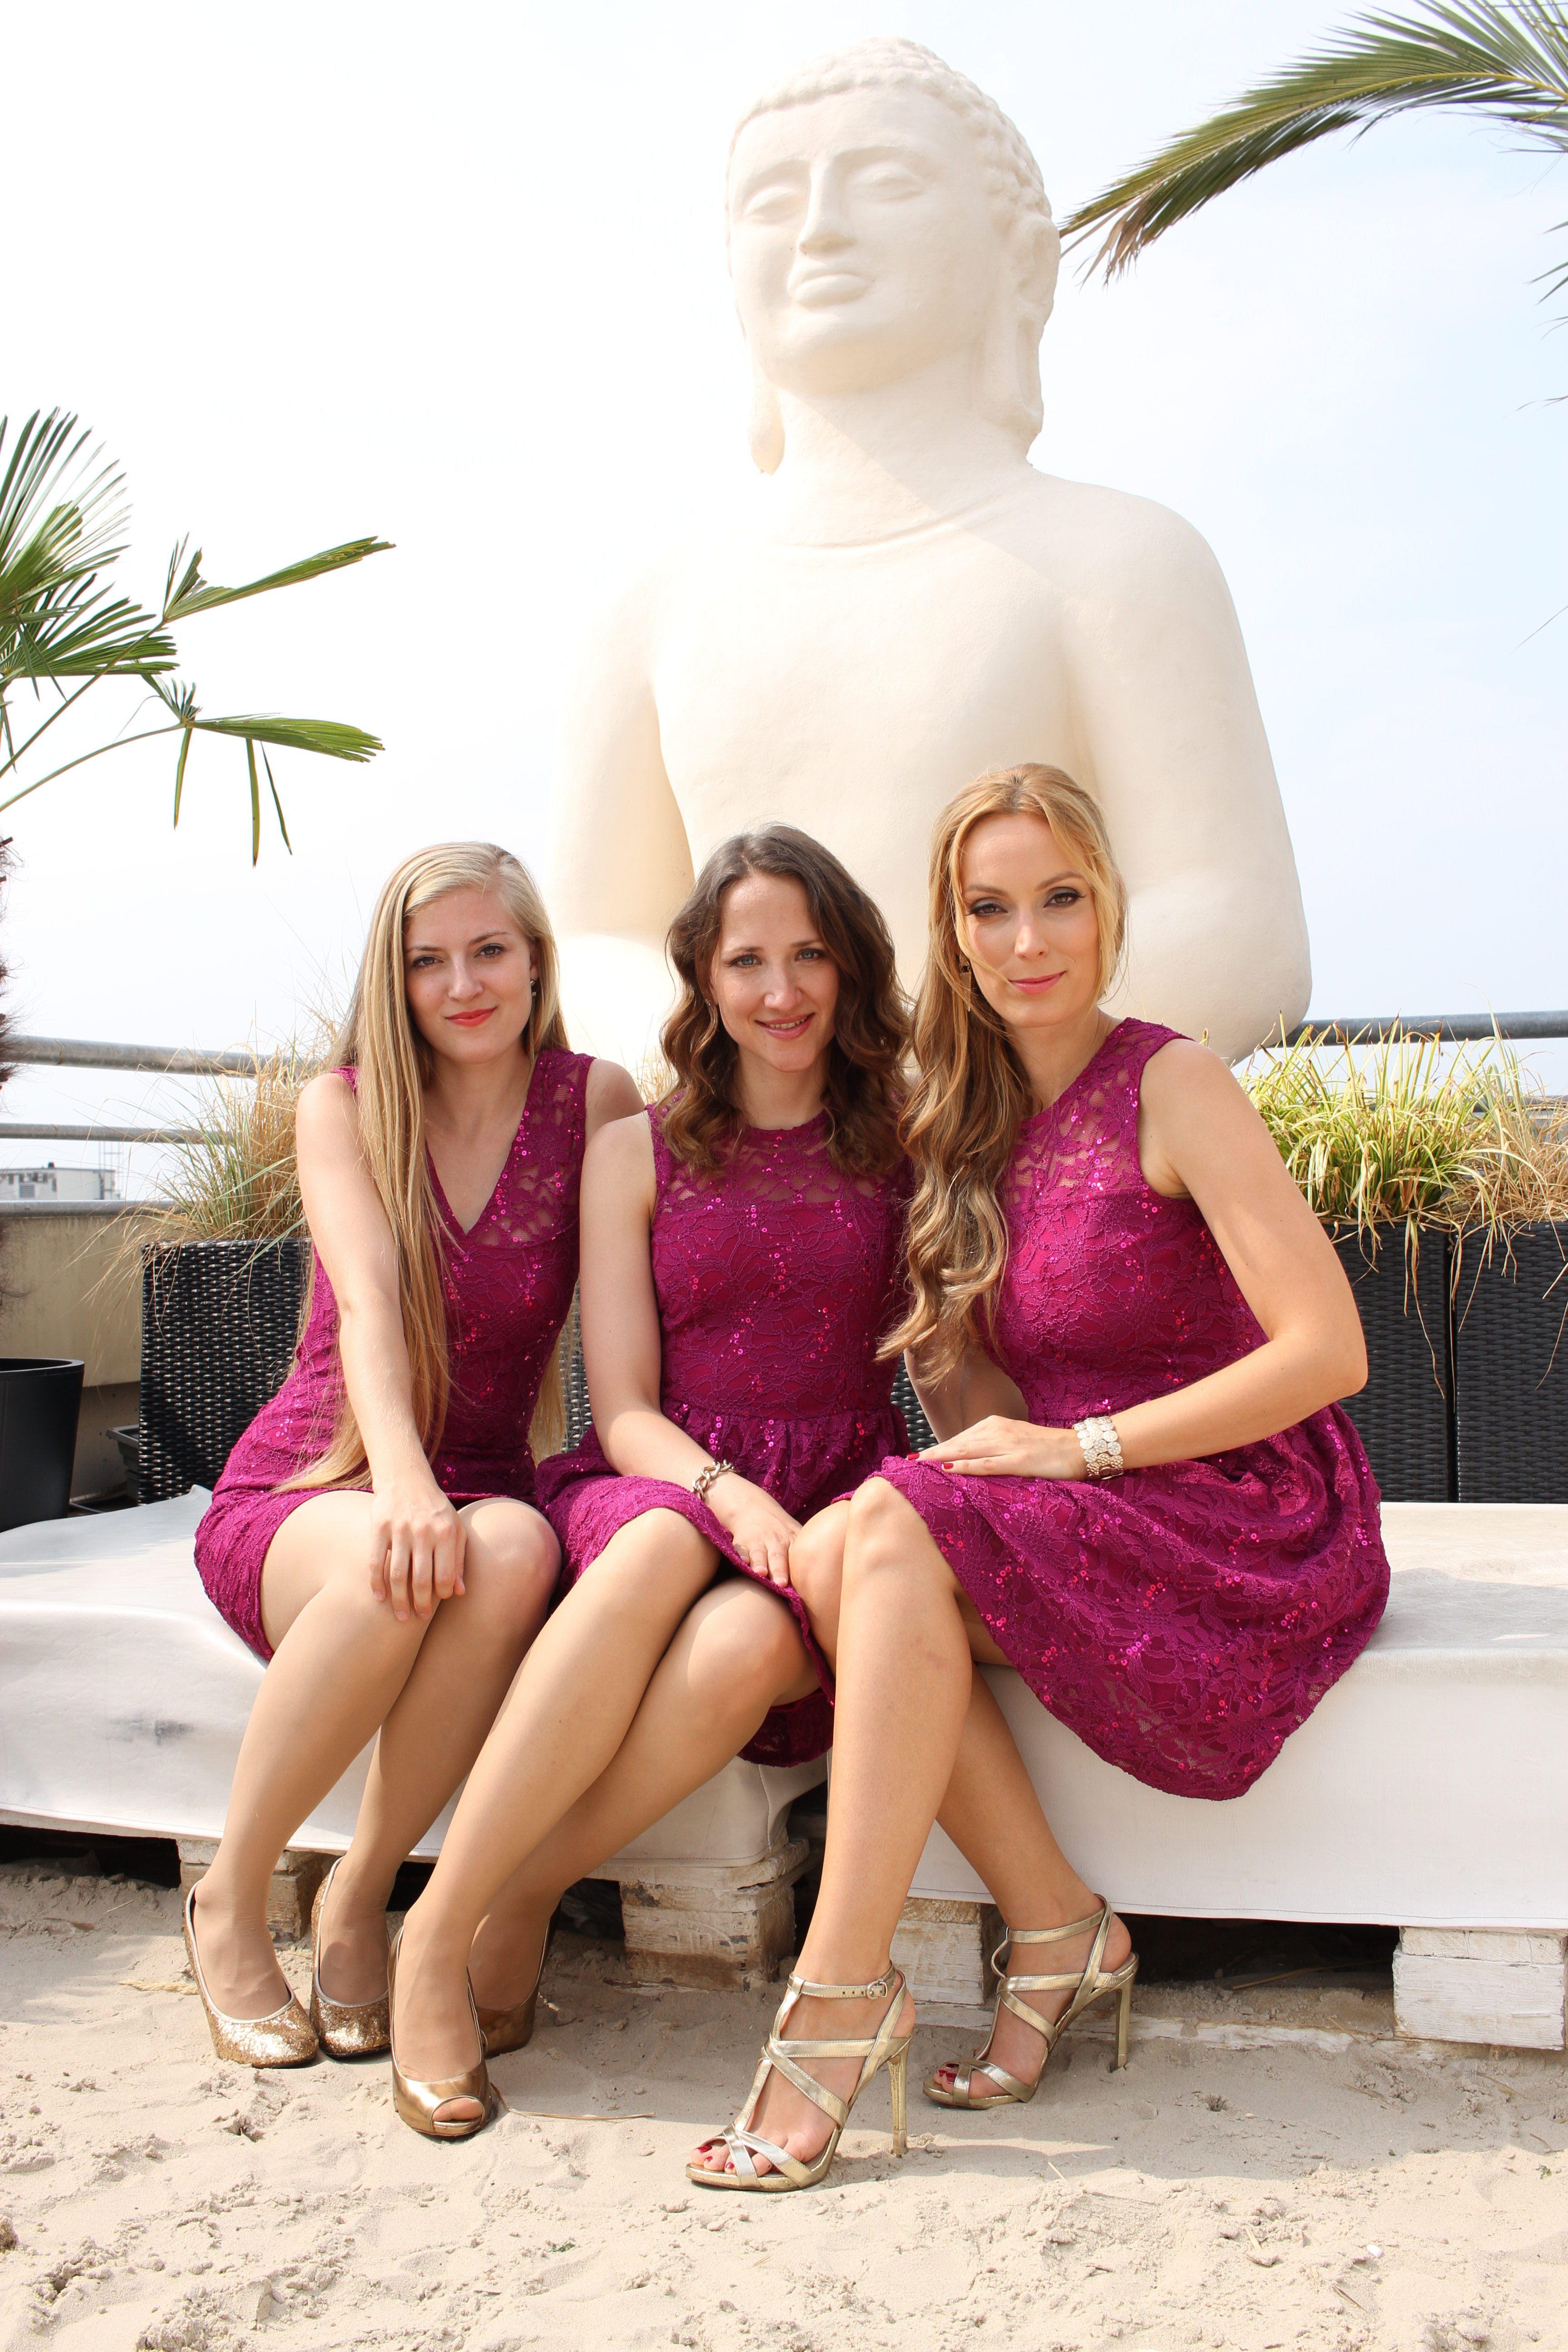 Miss mobile-Trio